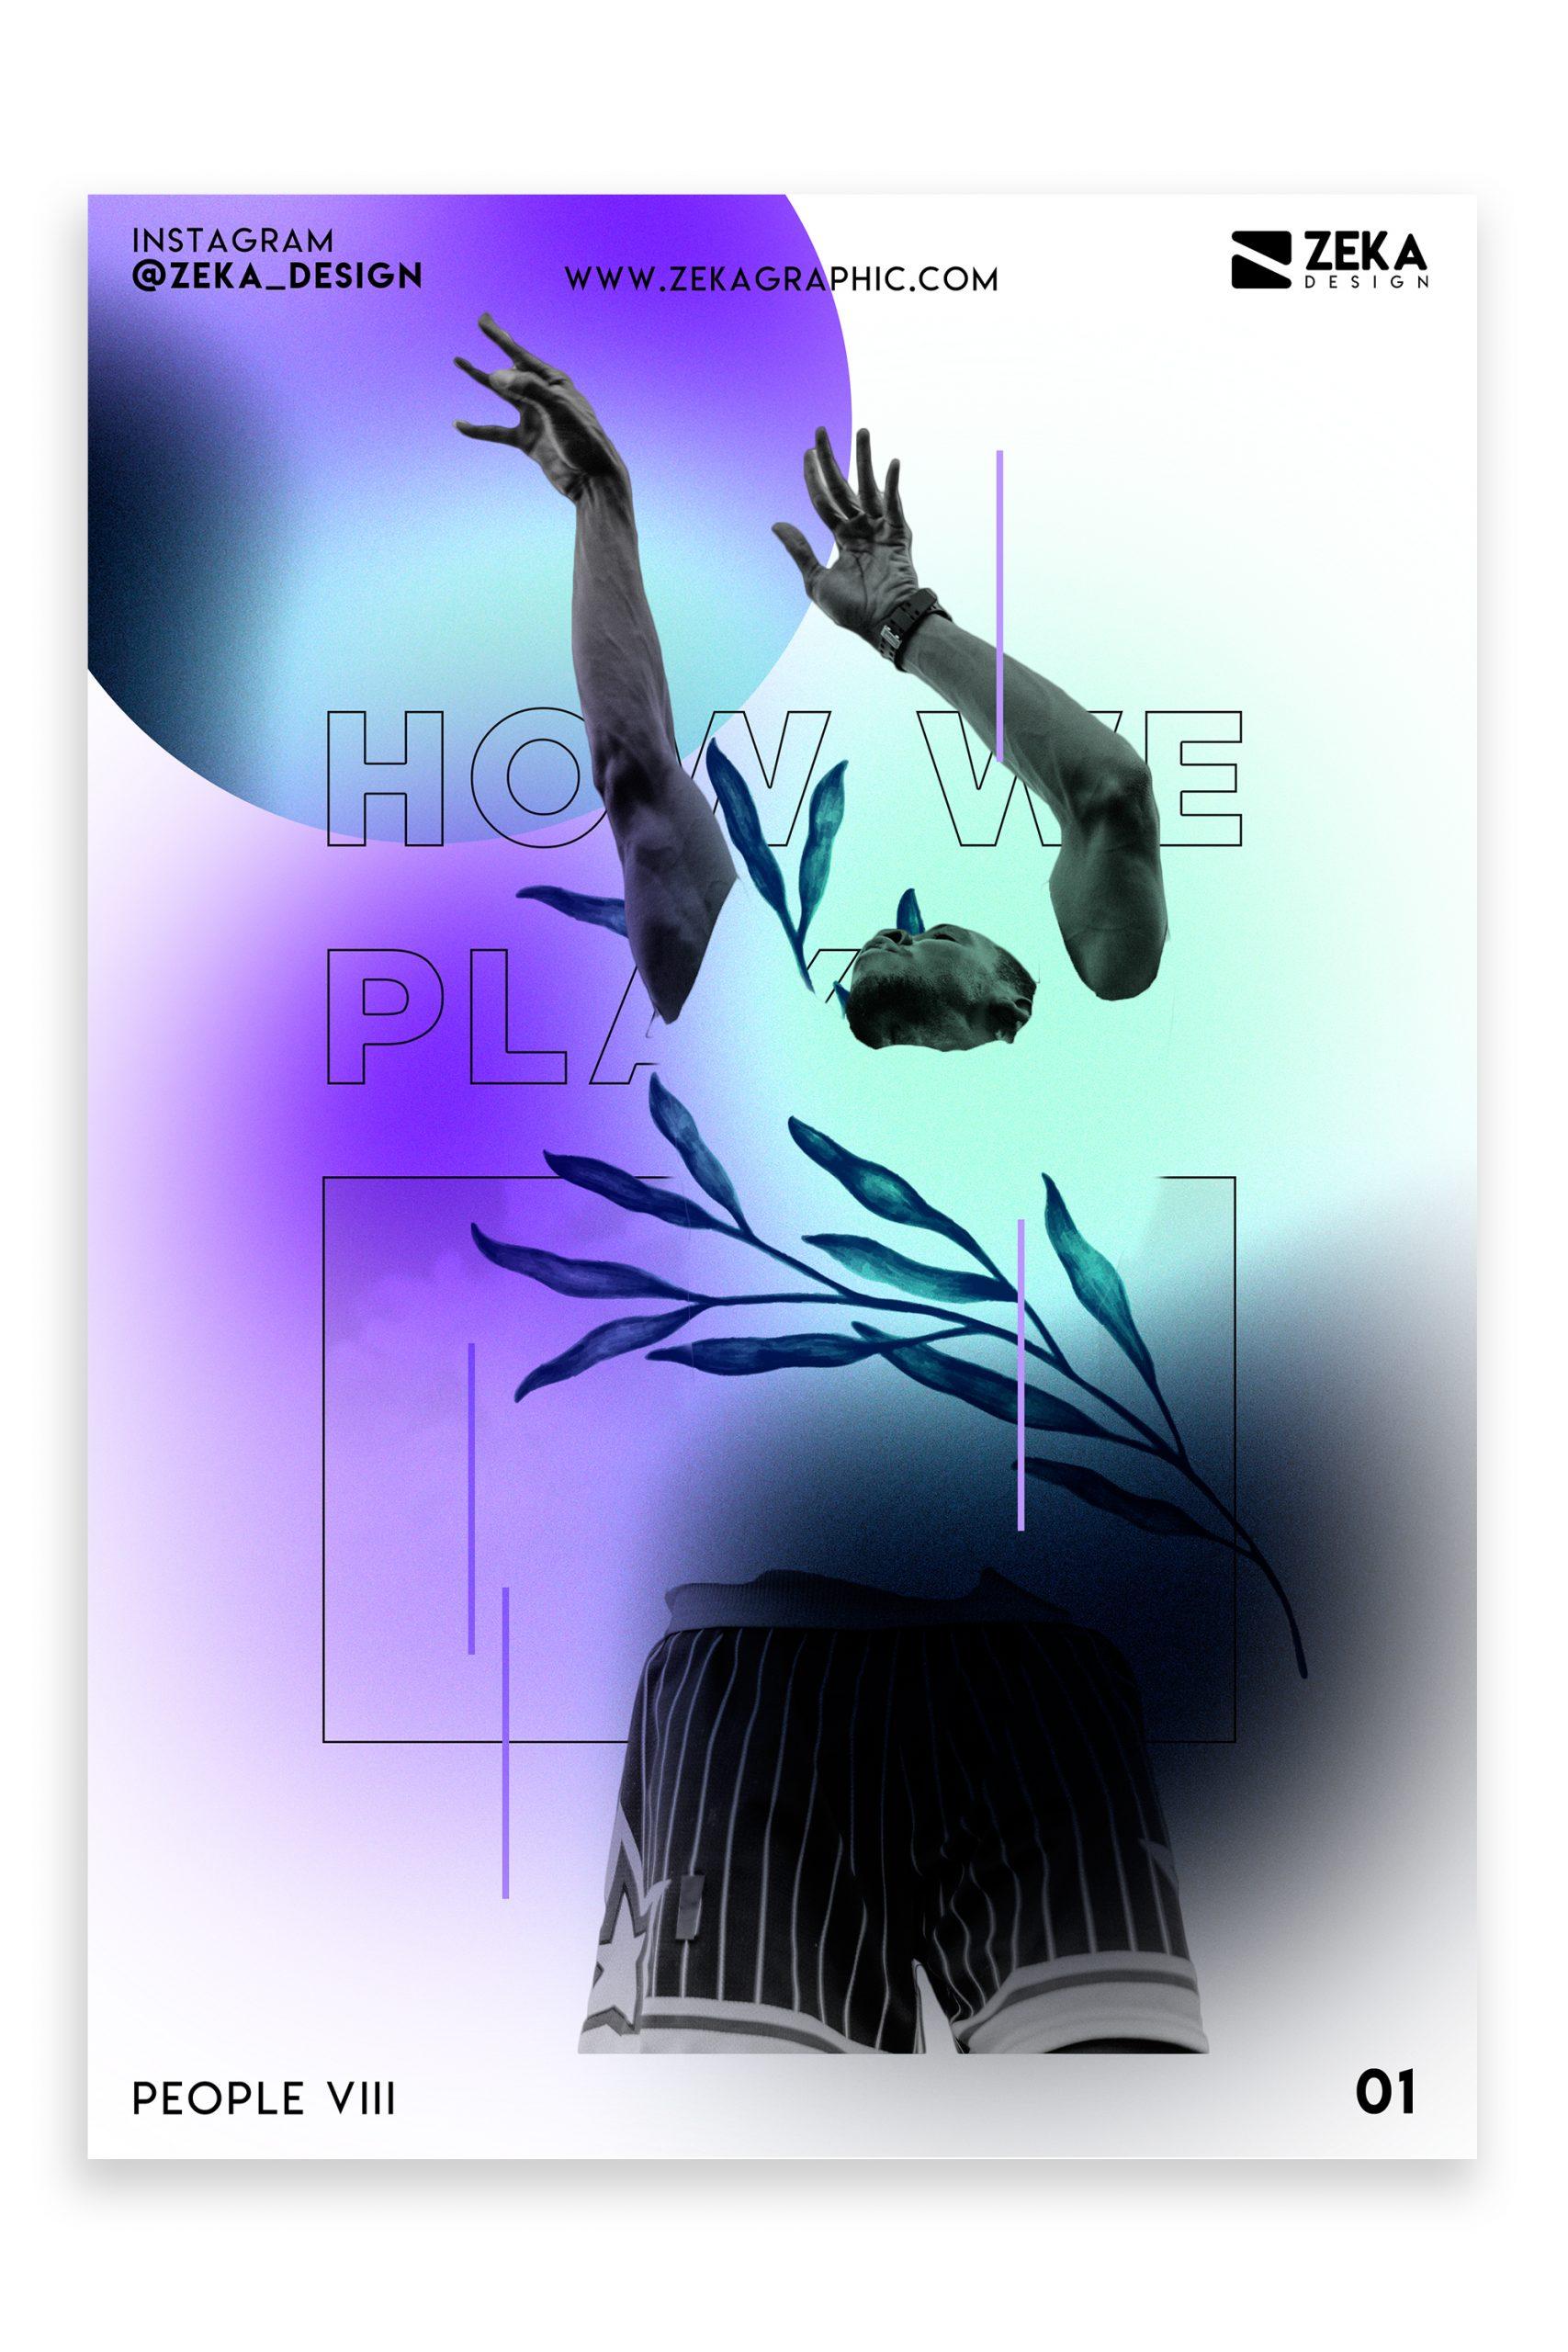 People VIII Poster Design Inspiration Zeka Design Graphic Design Portfolio 1